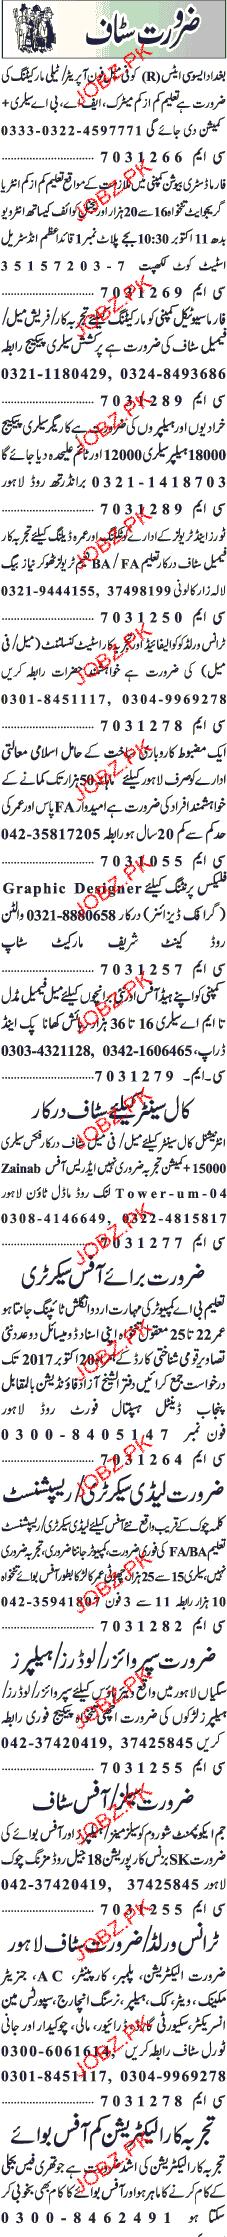 Female Telephone Operators, Marketing Staff Job Opportunity